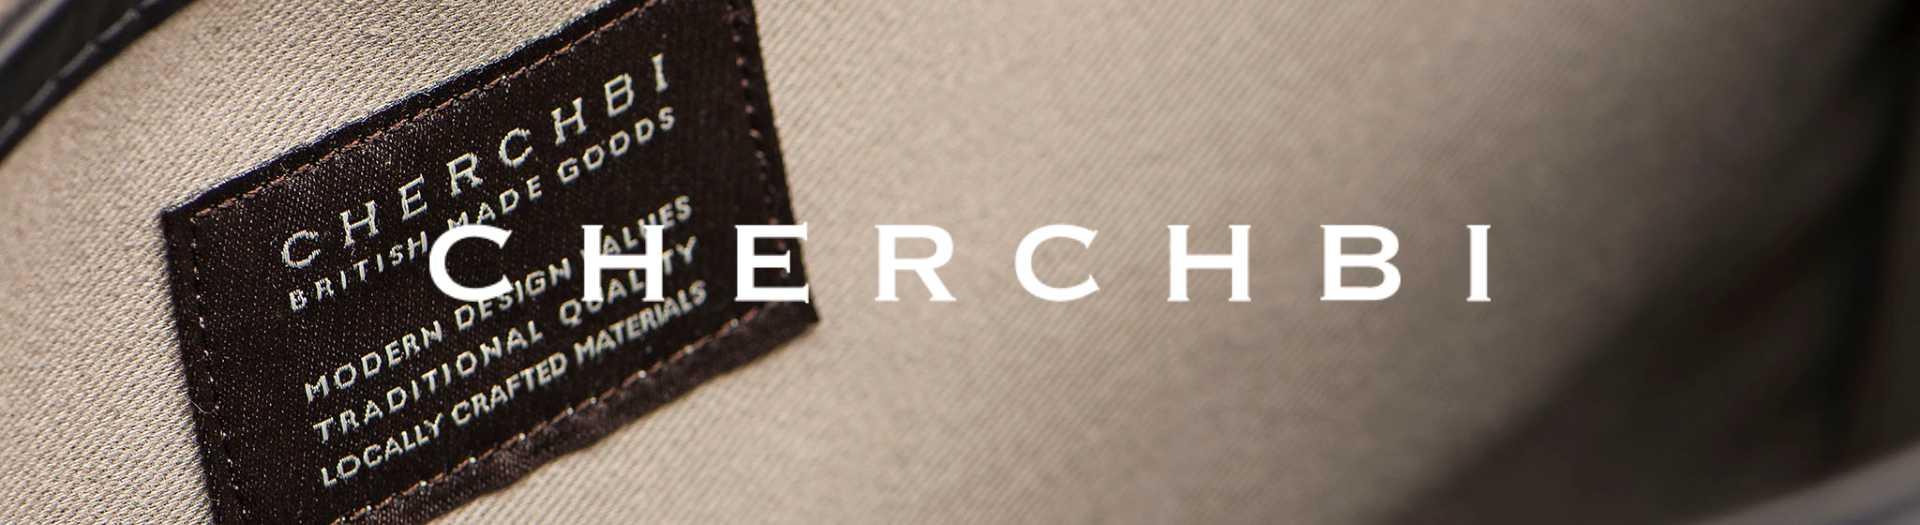 Cherchbi brand header british made bag brand